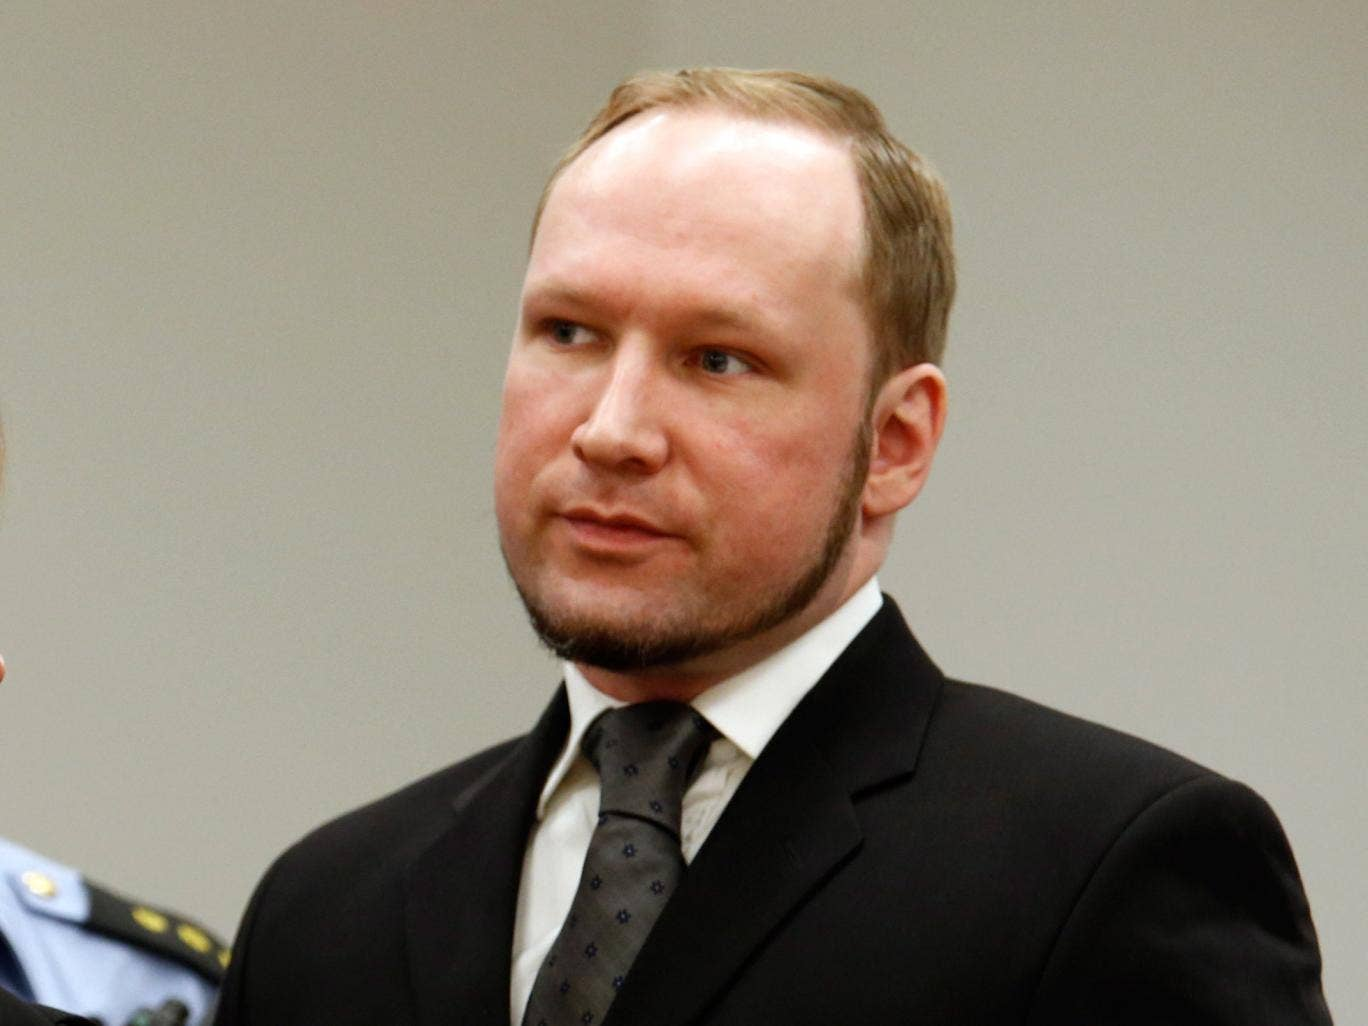 Anders Breivik, Norwegian shooter: biography, life in prison 4